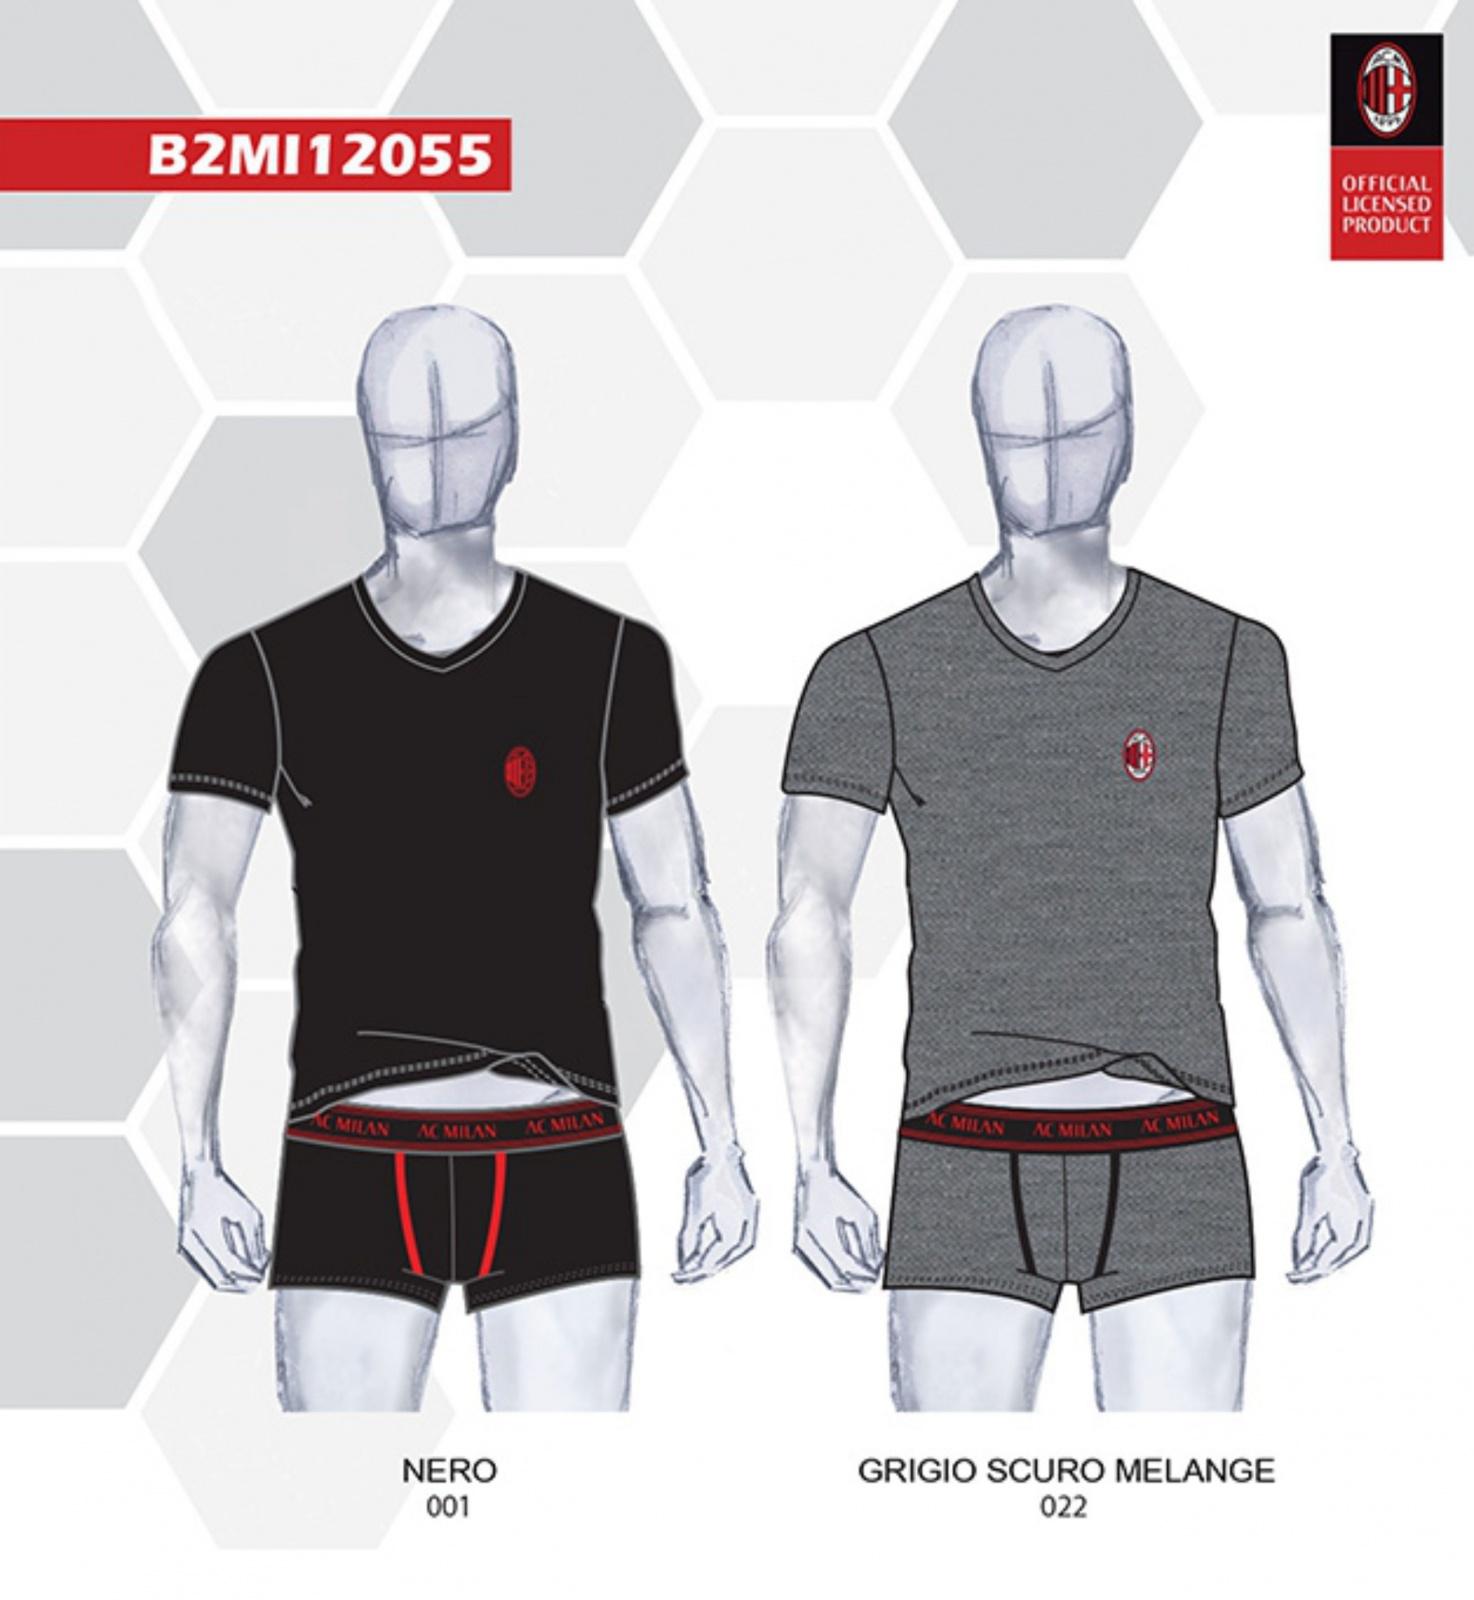 Complete UNDERWEAR Boy AC MILAN Official Product UNDERWEAR Boxer t-shirt Romagnoli Ibrahimovic Leao Rebic Donnarumma